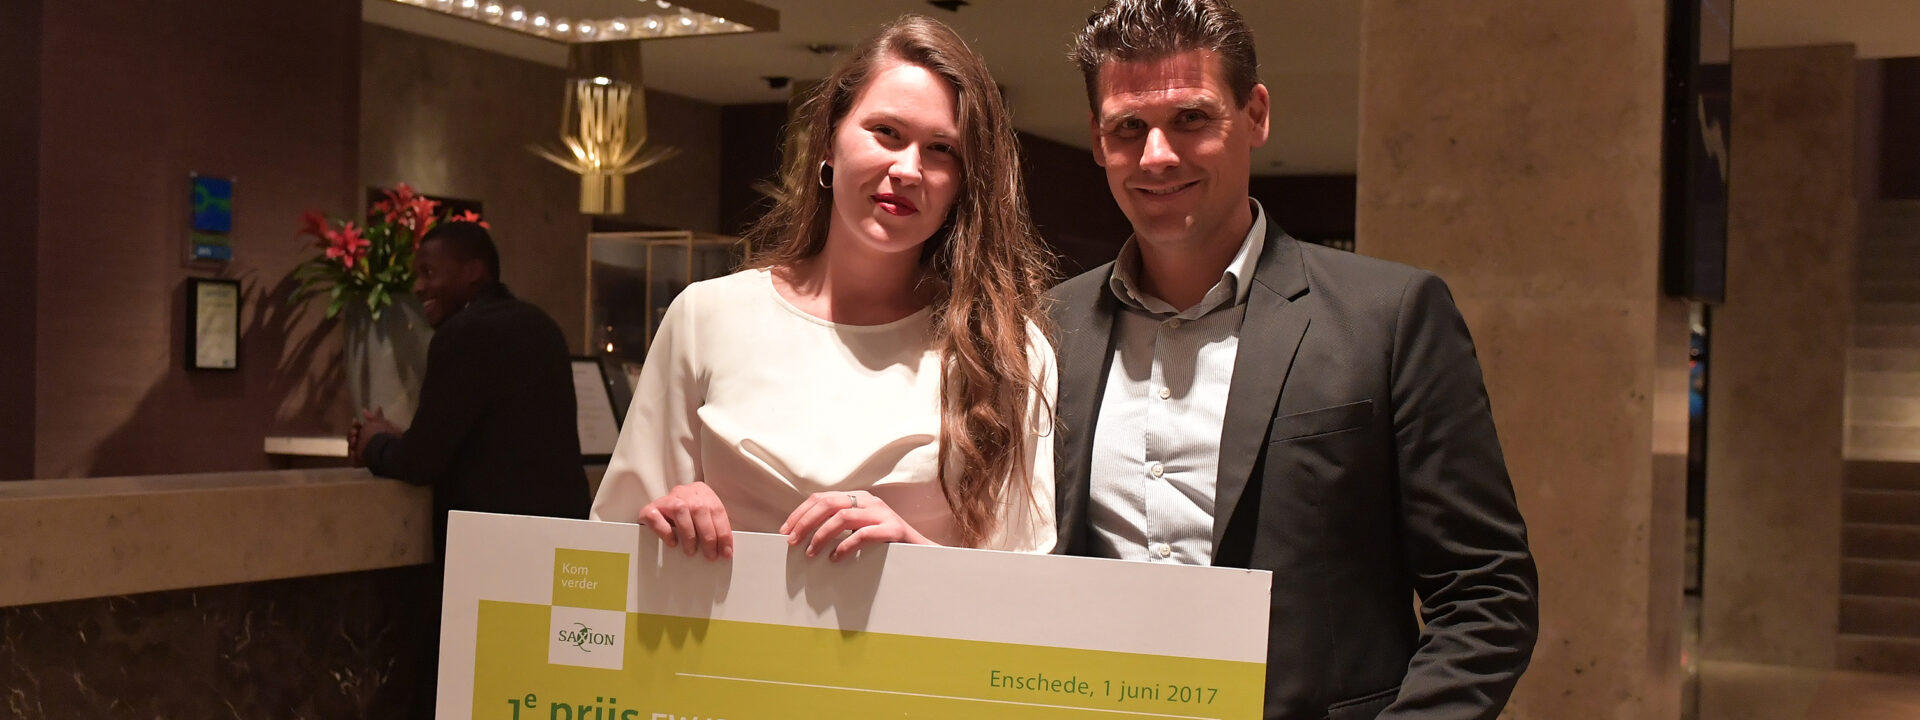 EW Facility Services stimuleert jong ondernemerschap en reikt 8e Ondernemers Award uit